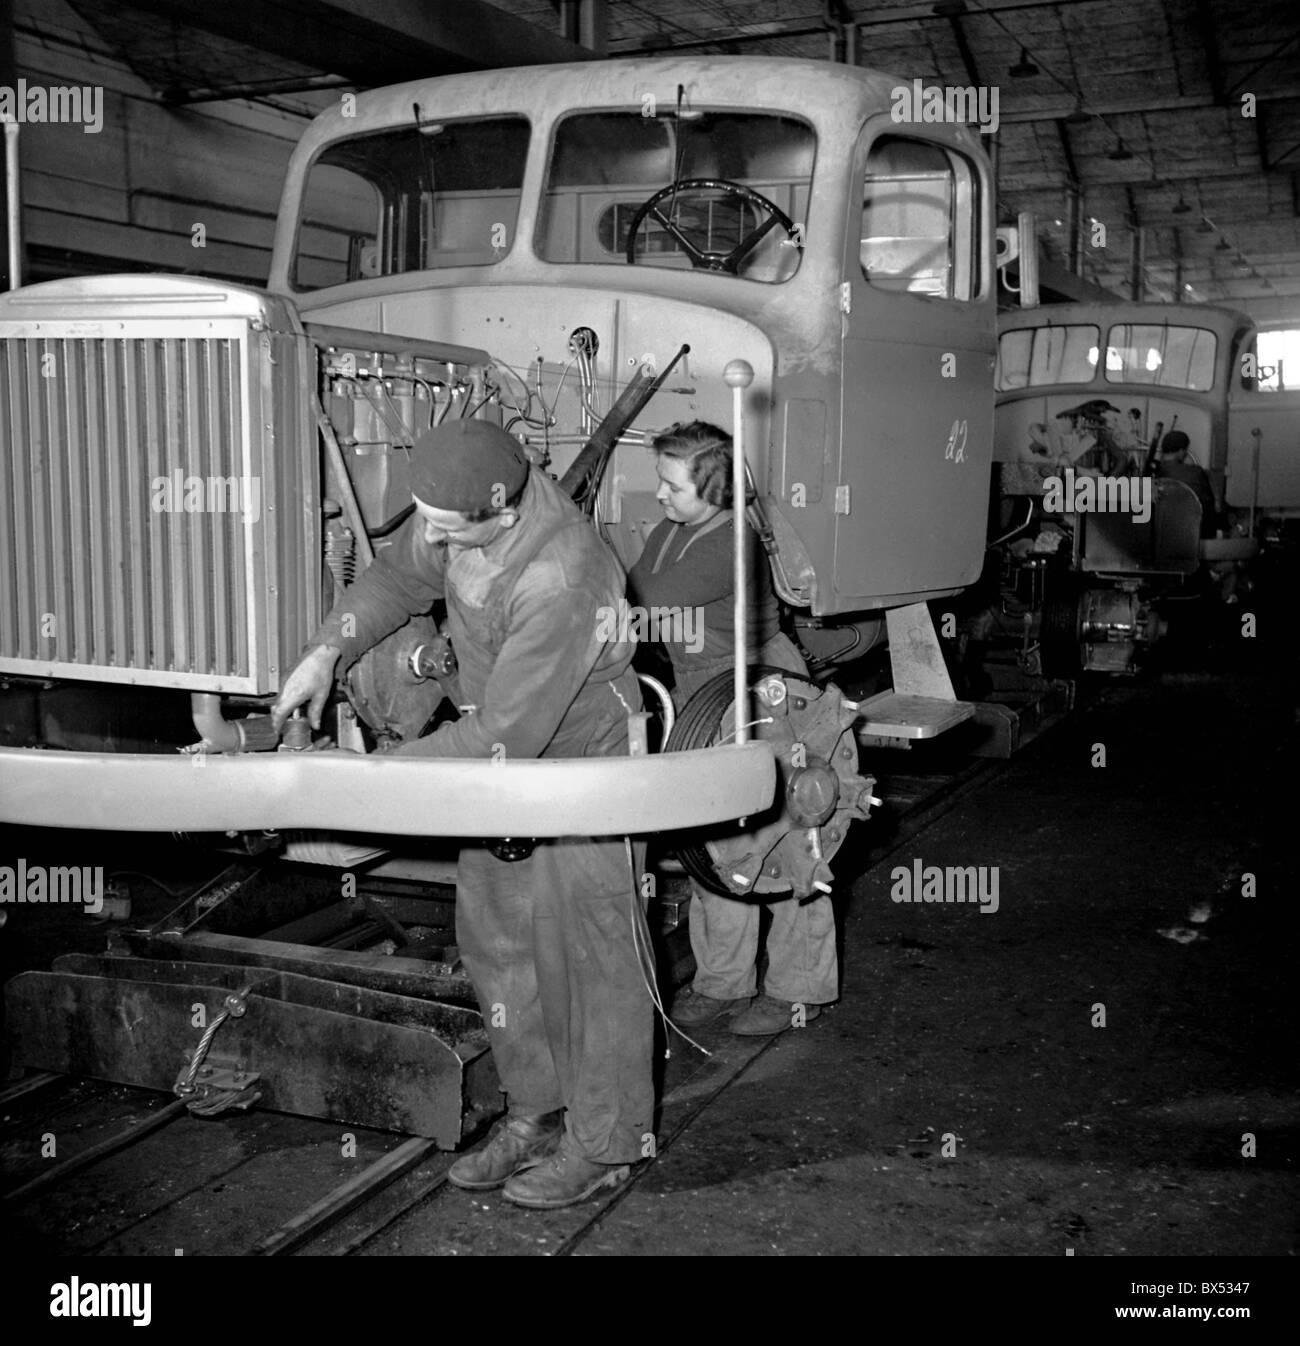 Production of Liaz 706 RS trucks at Liaz factory in Mnichovo Hradiste, Czechoslovakia, 1956. CTK Photo/Karel Mevald - Stock Image